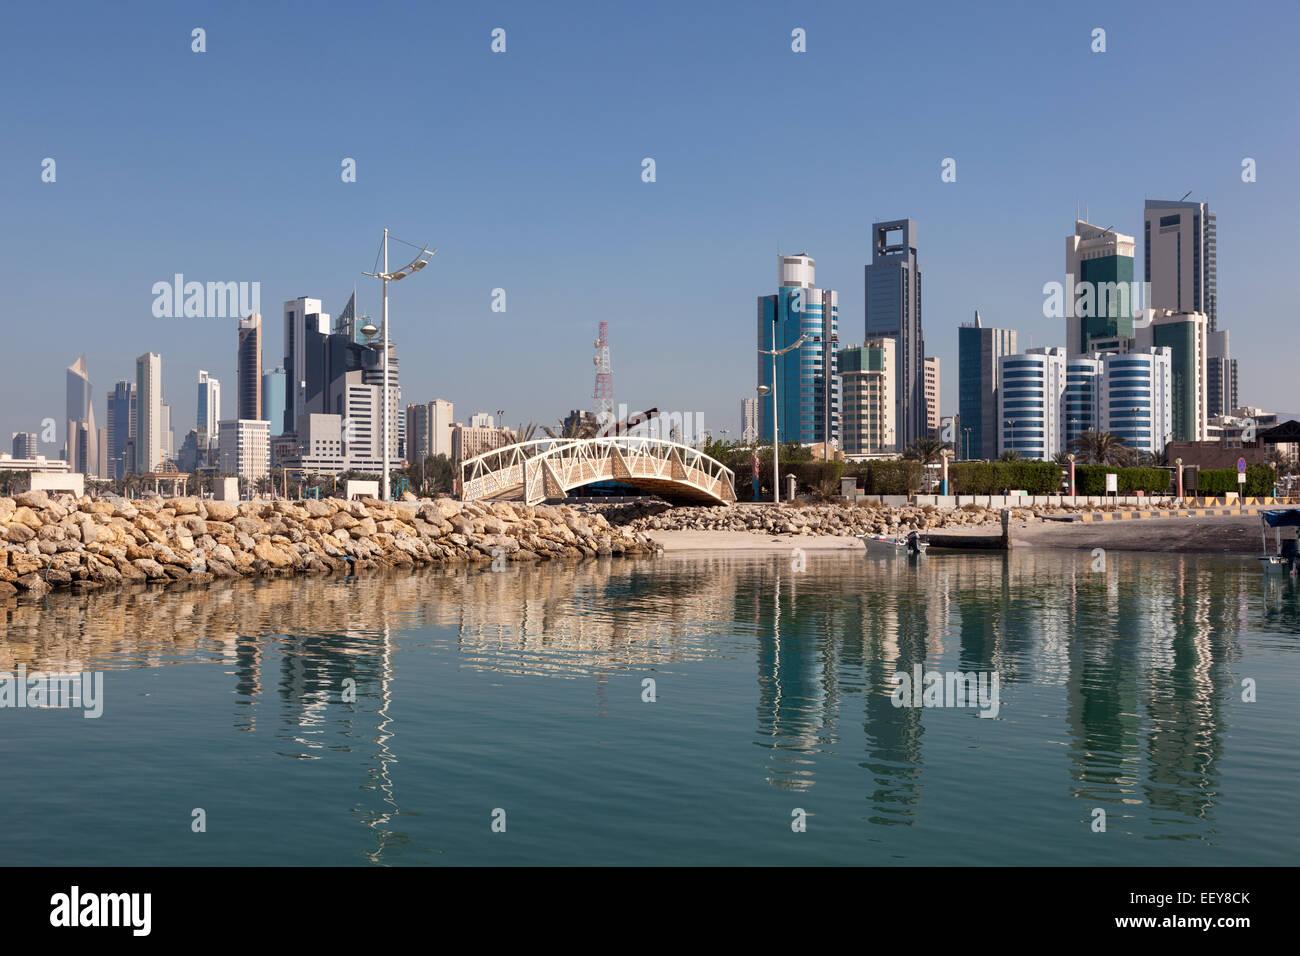 Skyline of Kuwait City, Middle East - Stock Image